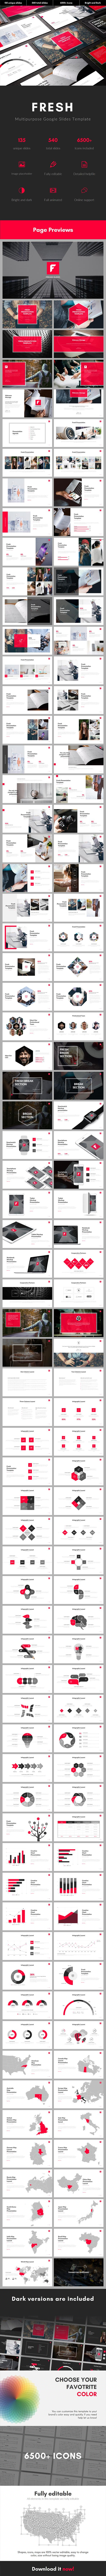 Fresh Multipurpose Google Slides Template - Google Slides Presentation Templates